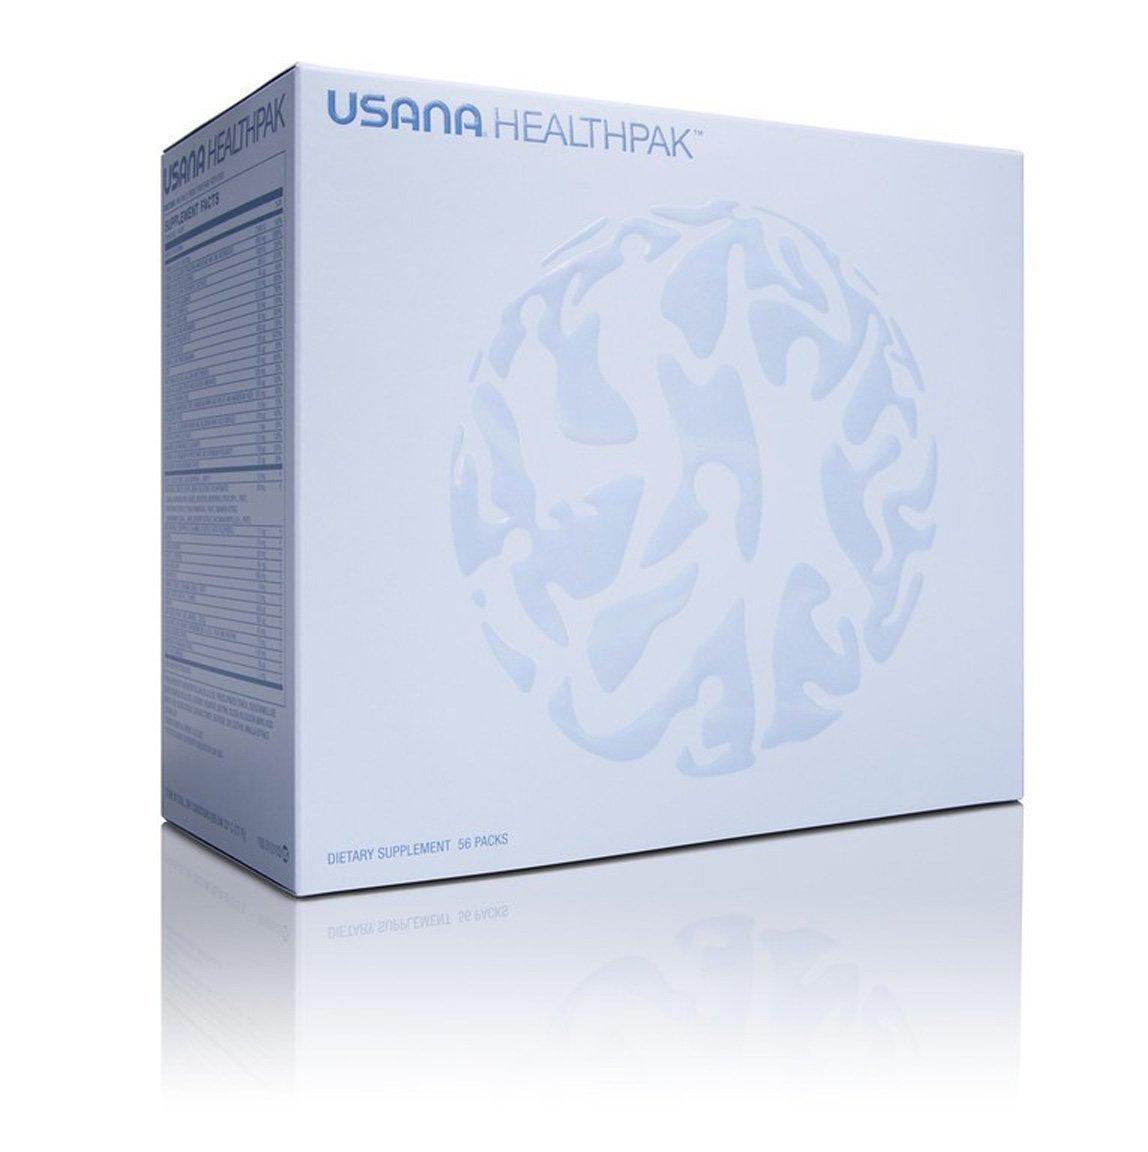 USANA HealthPak 100 56 packs ~ 4 Week Supply